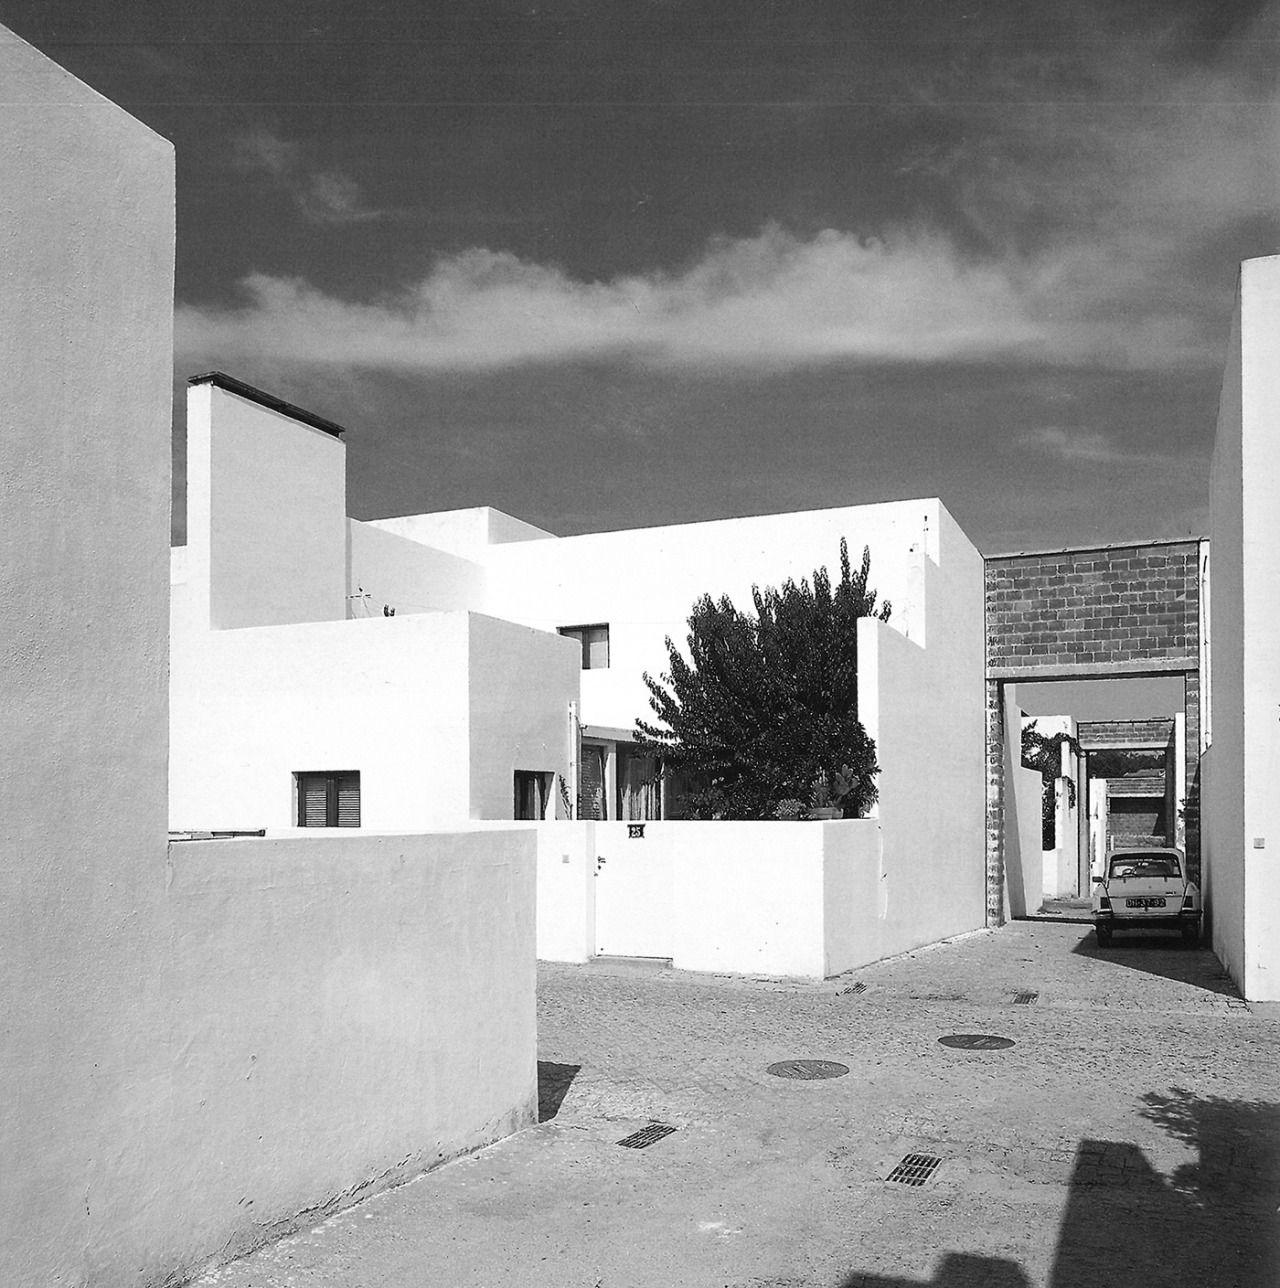 Lvaro siza barrio de la malagueira evora portugal for Arquitectos de la arquitectura moderna